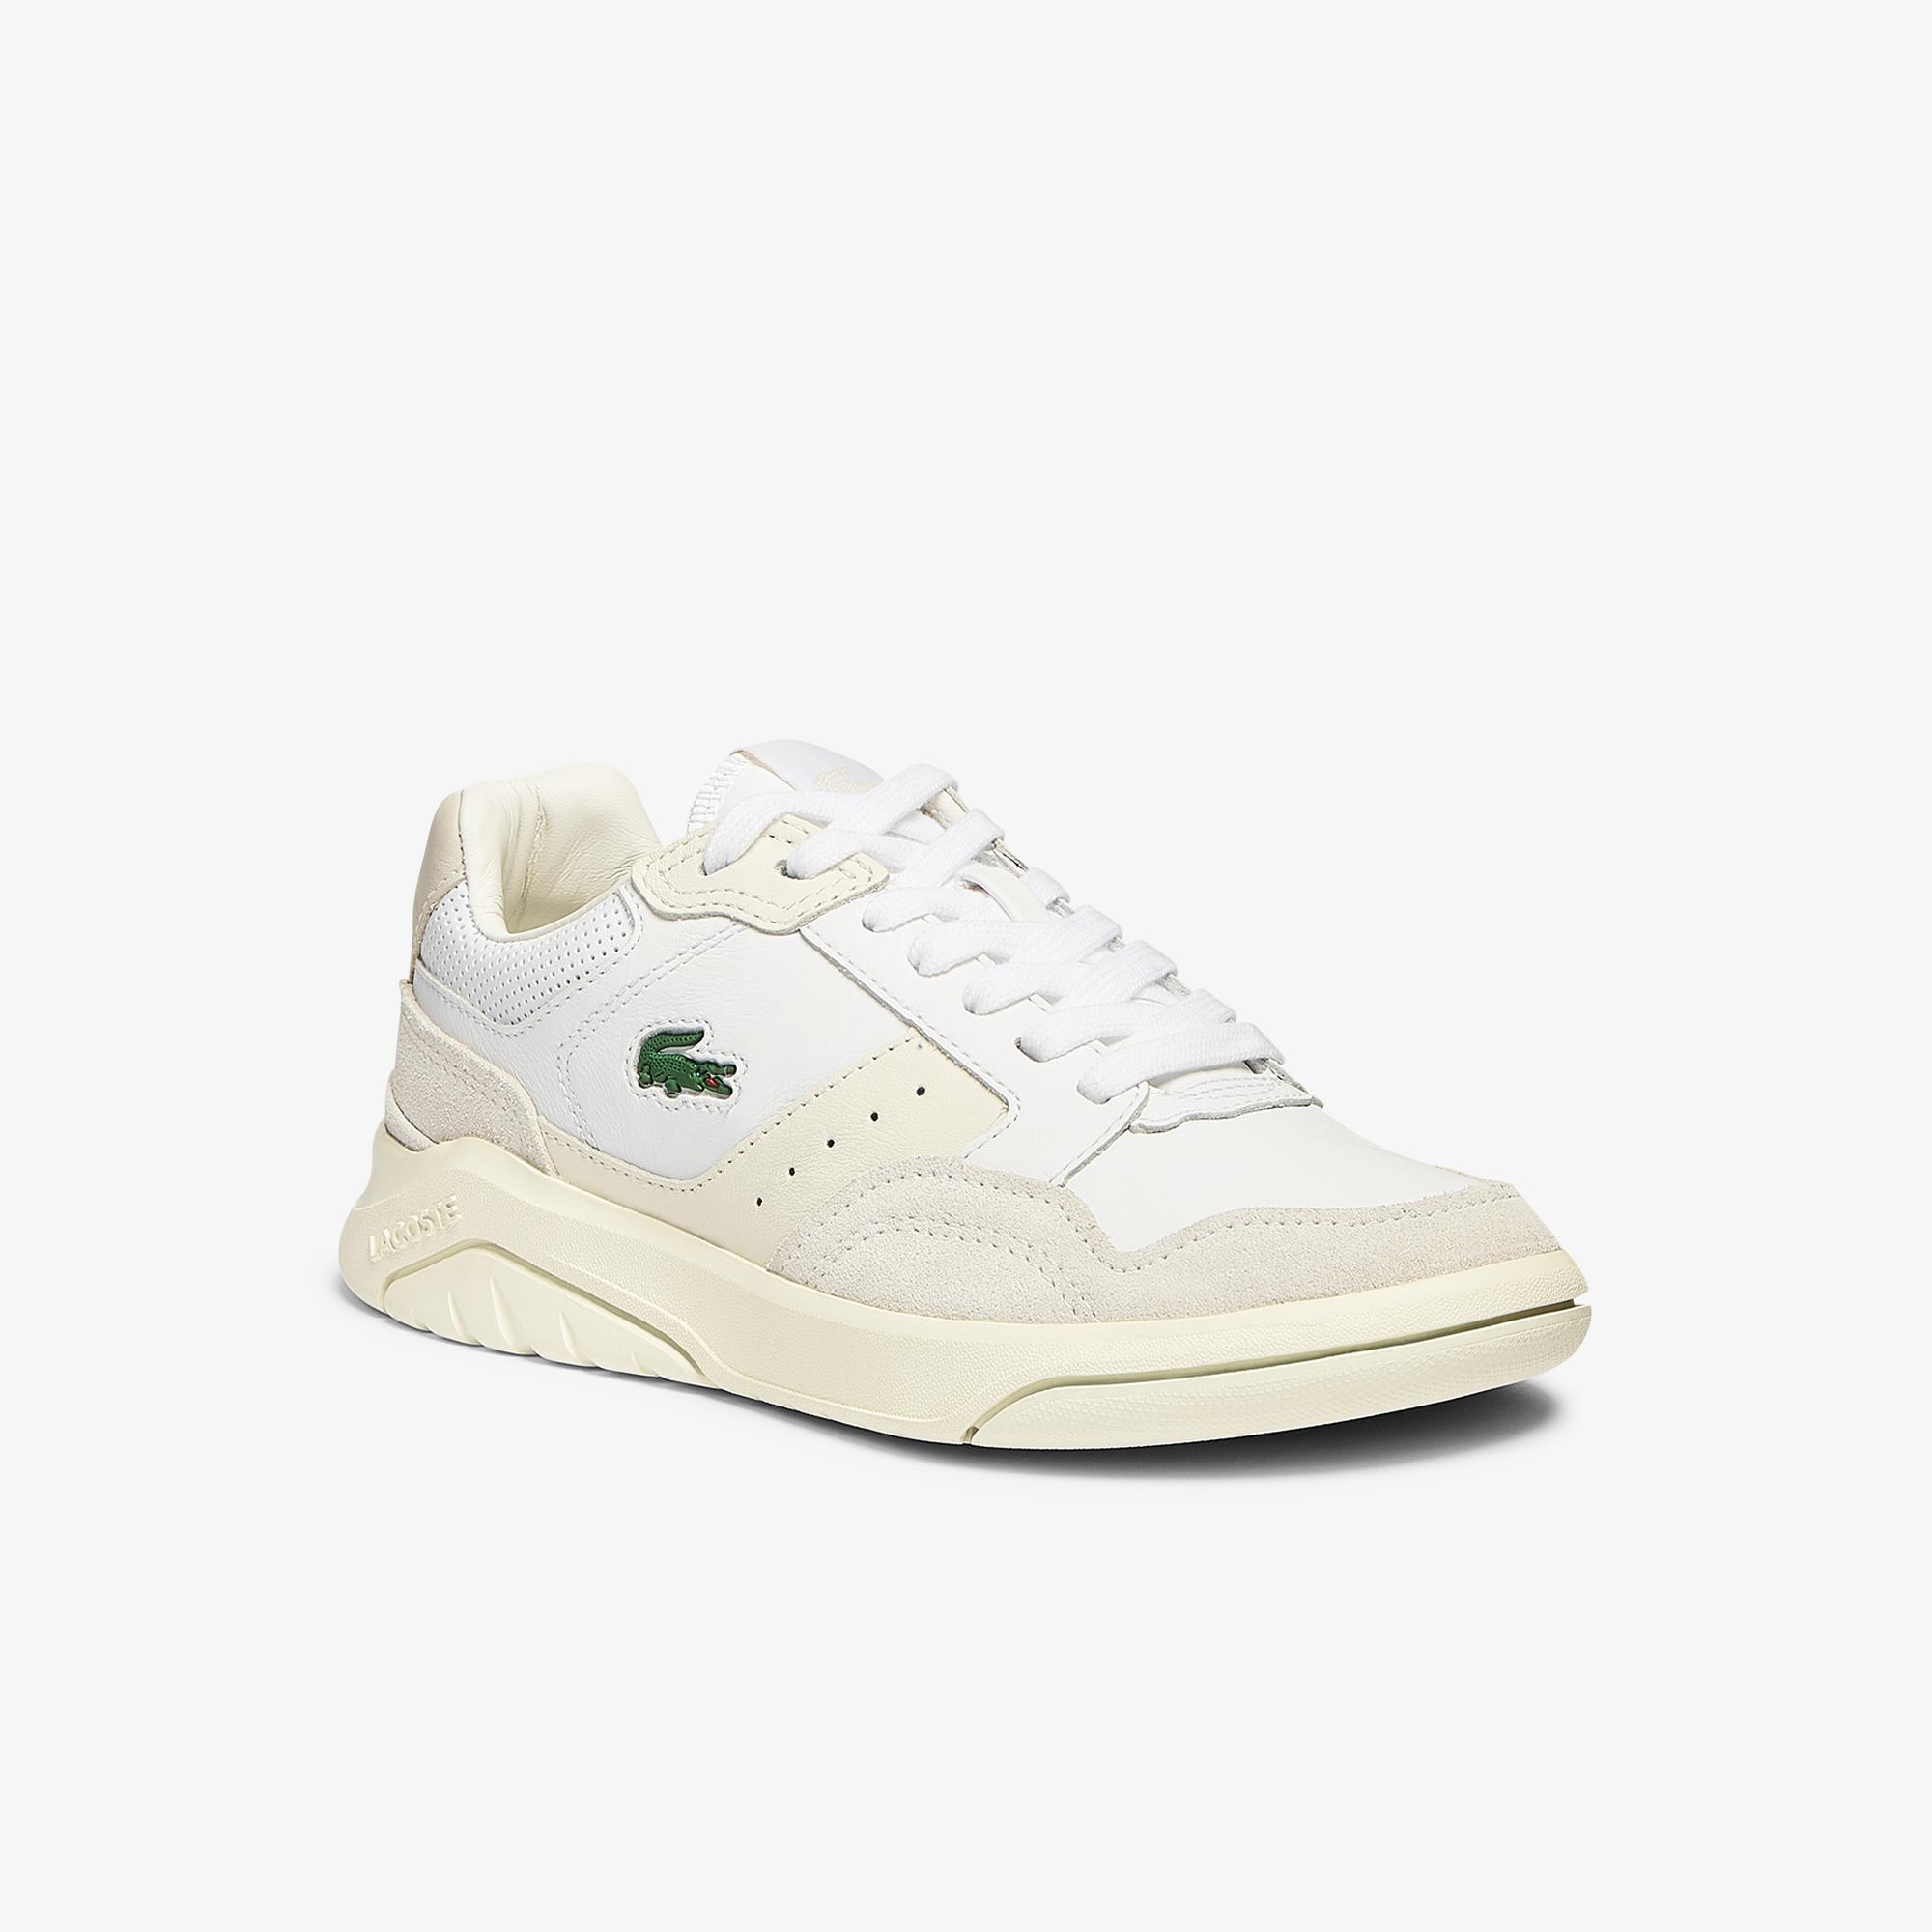 Lacoste Gameadvance Luxe 07211Sfa Kadın Bej - Beyaz Sneaker